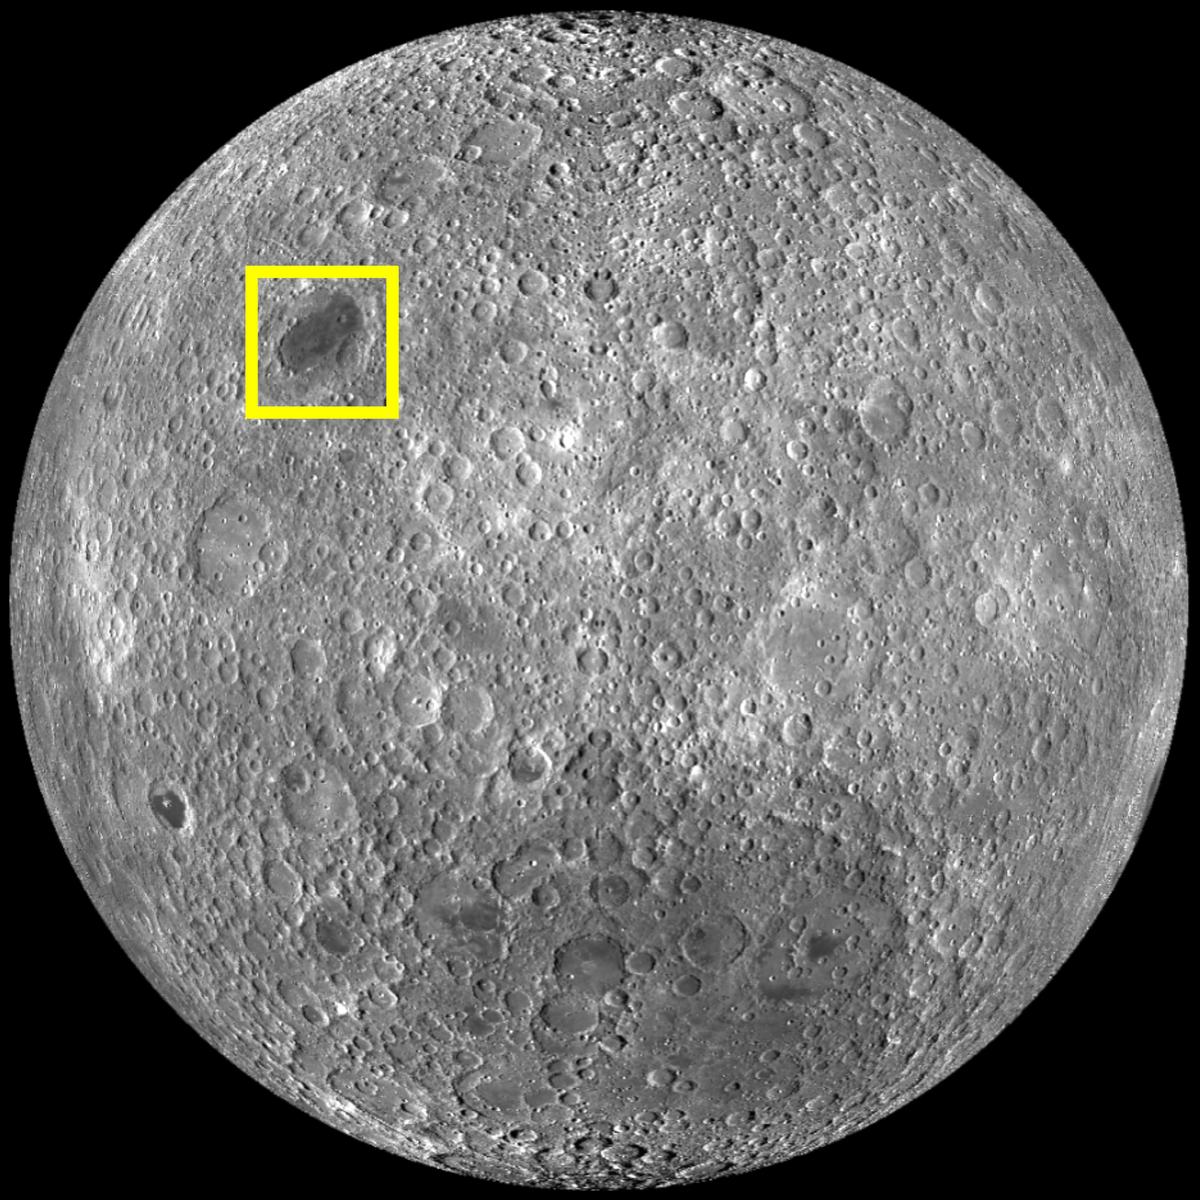 Moon Locations (Moscoviense Far Side)